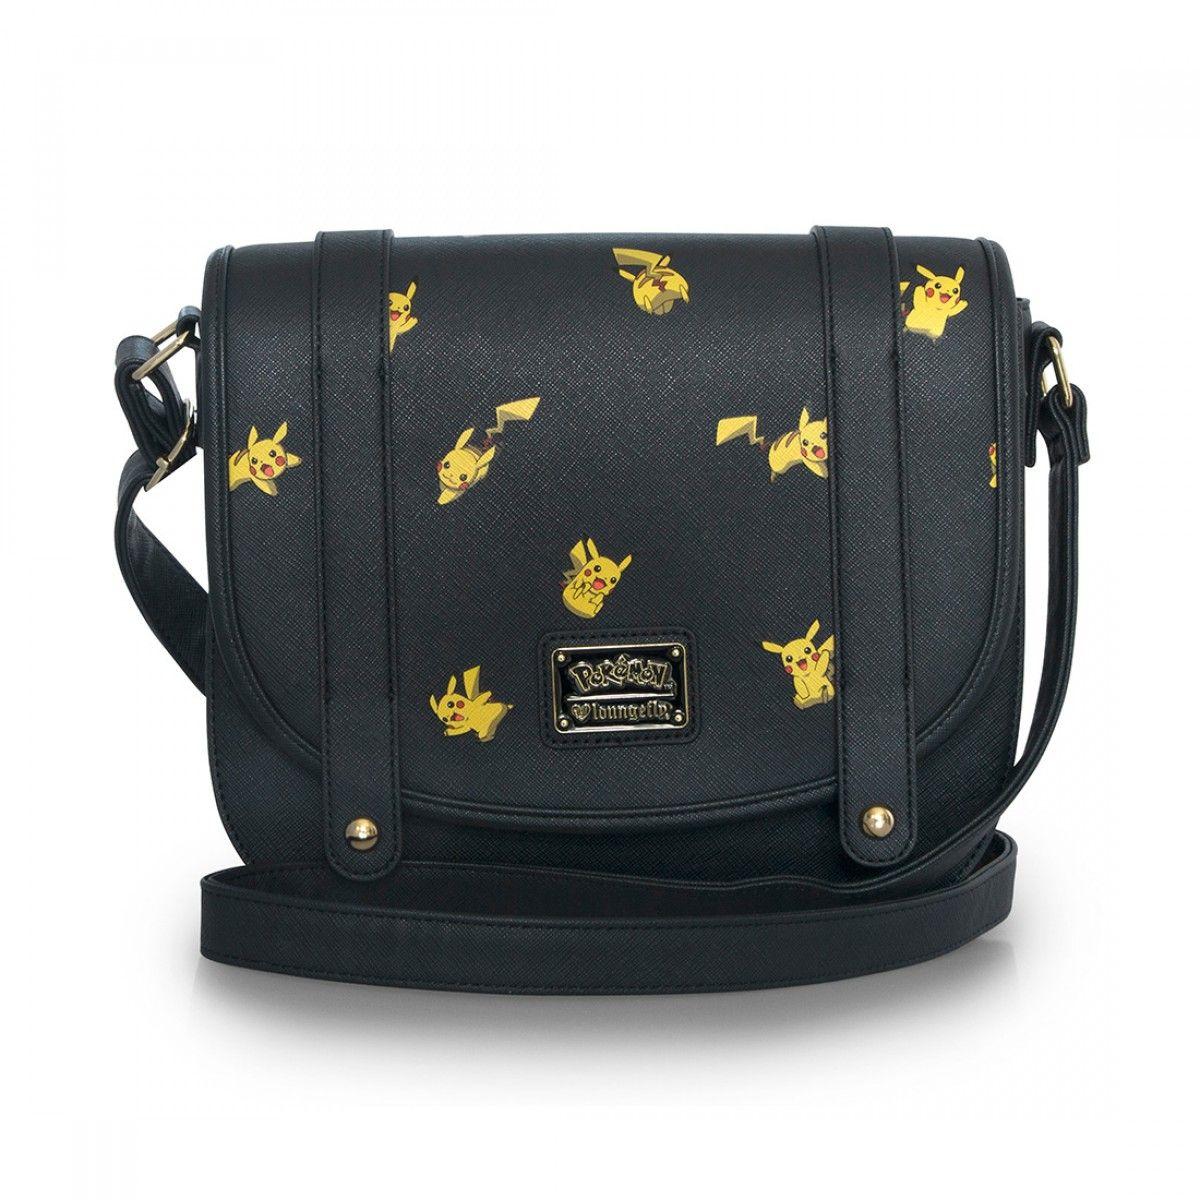 2c67b43e5 Loungefly x Pokémon Pikachu Print Crossbody Bag - Pokemon - Brands ...